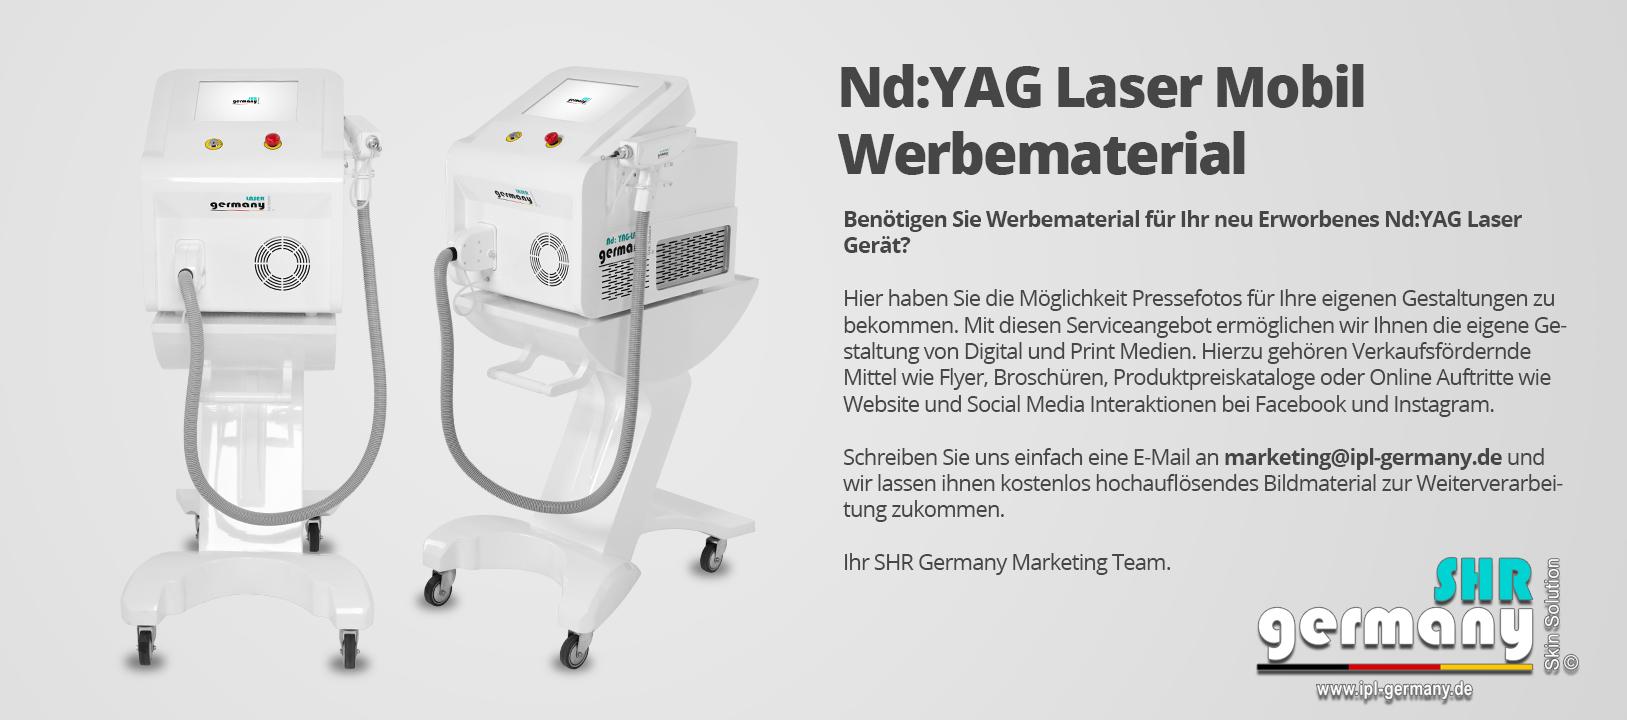 SHR-Germany_YaG_LASER_Mobil_Werbematerial